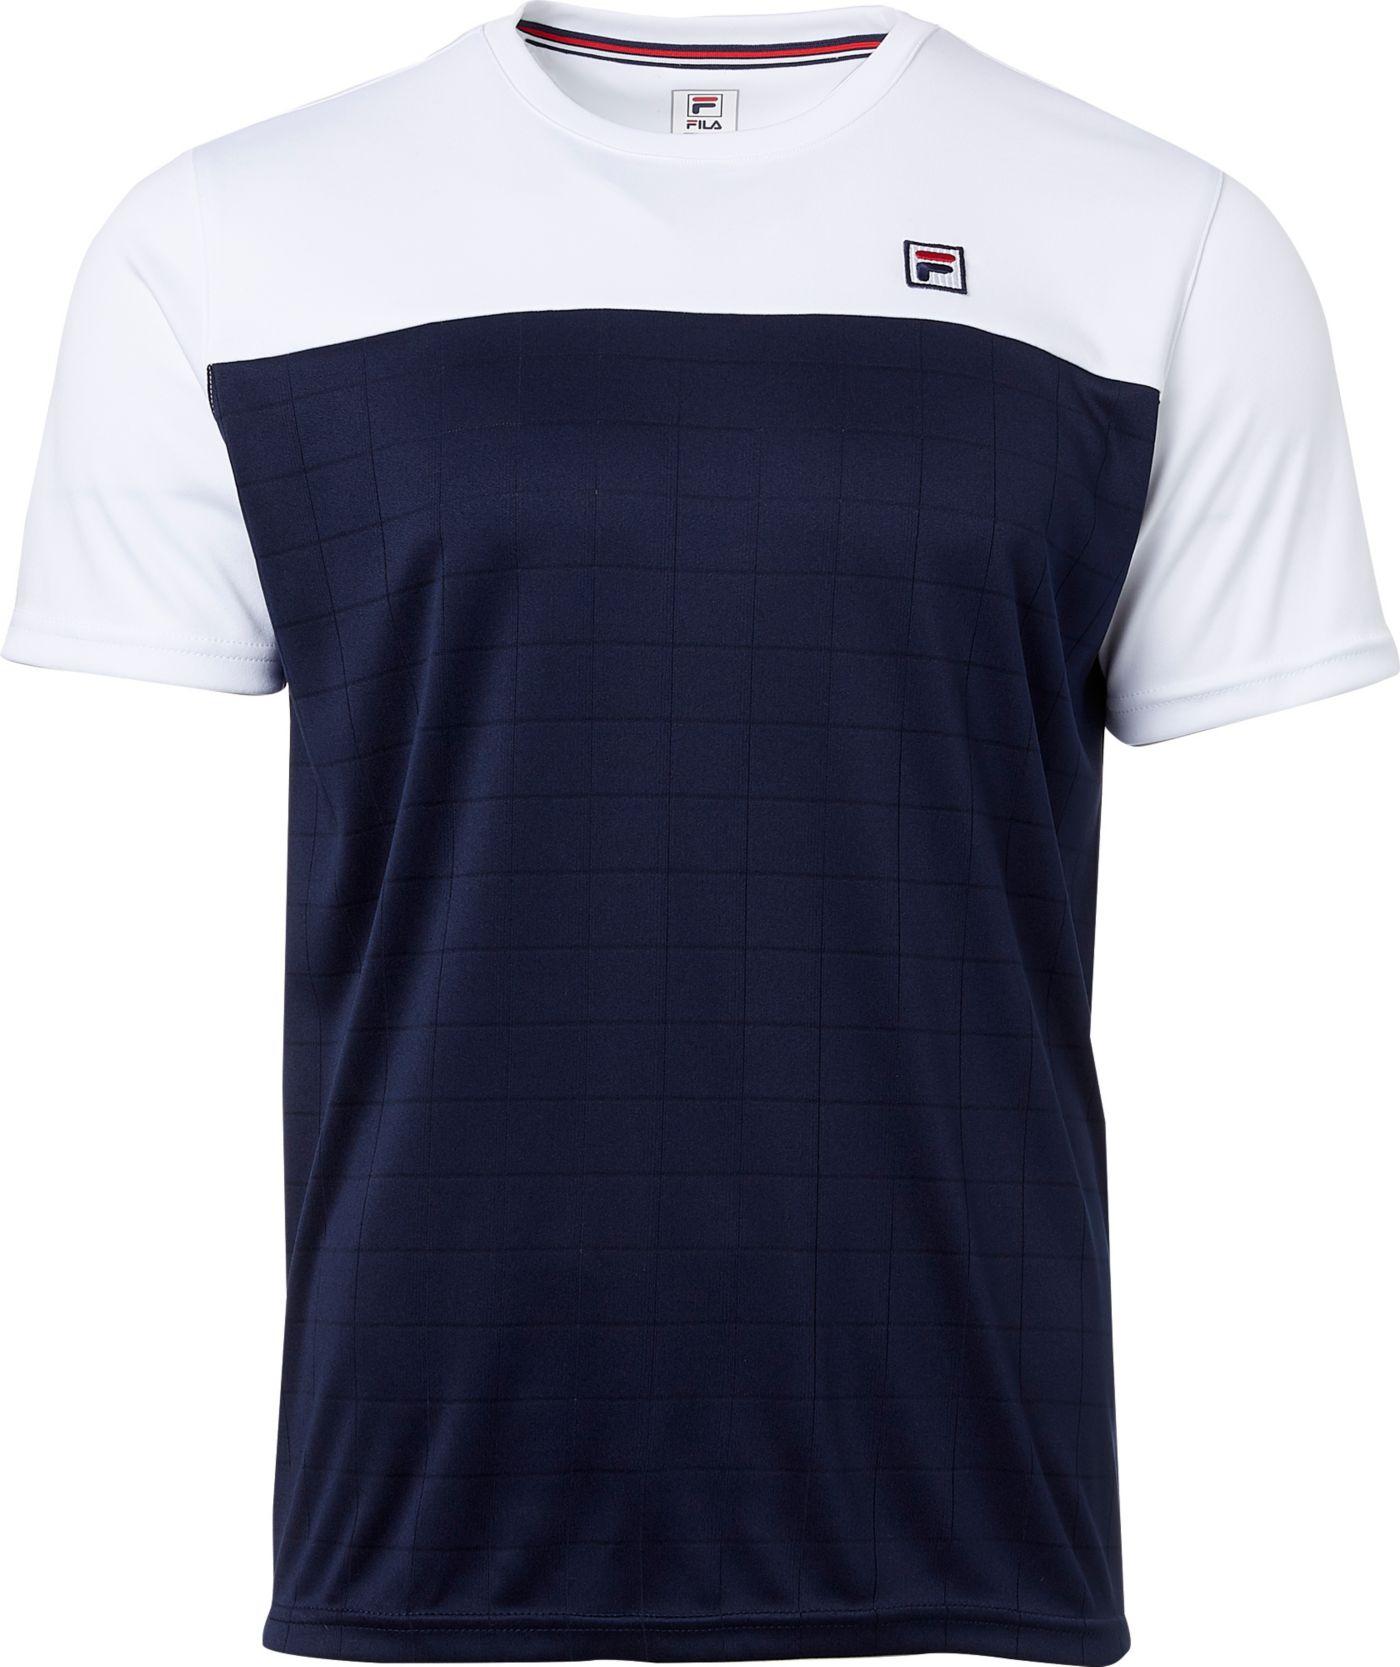 FILA Men's Heritage Grid Crew Tennis T-Shirt